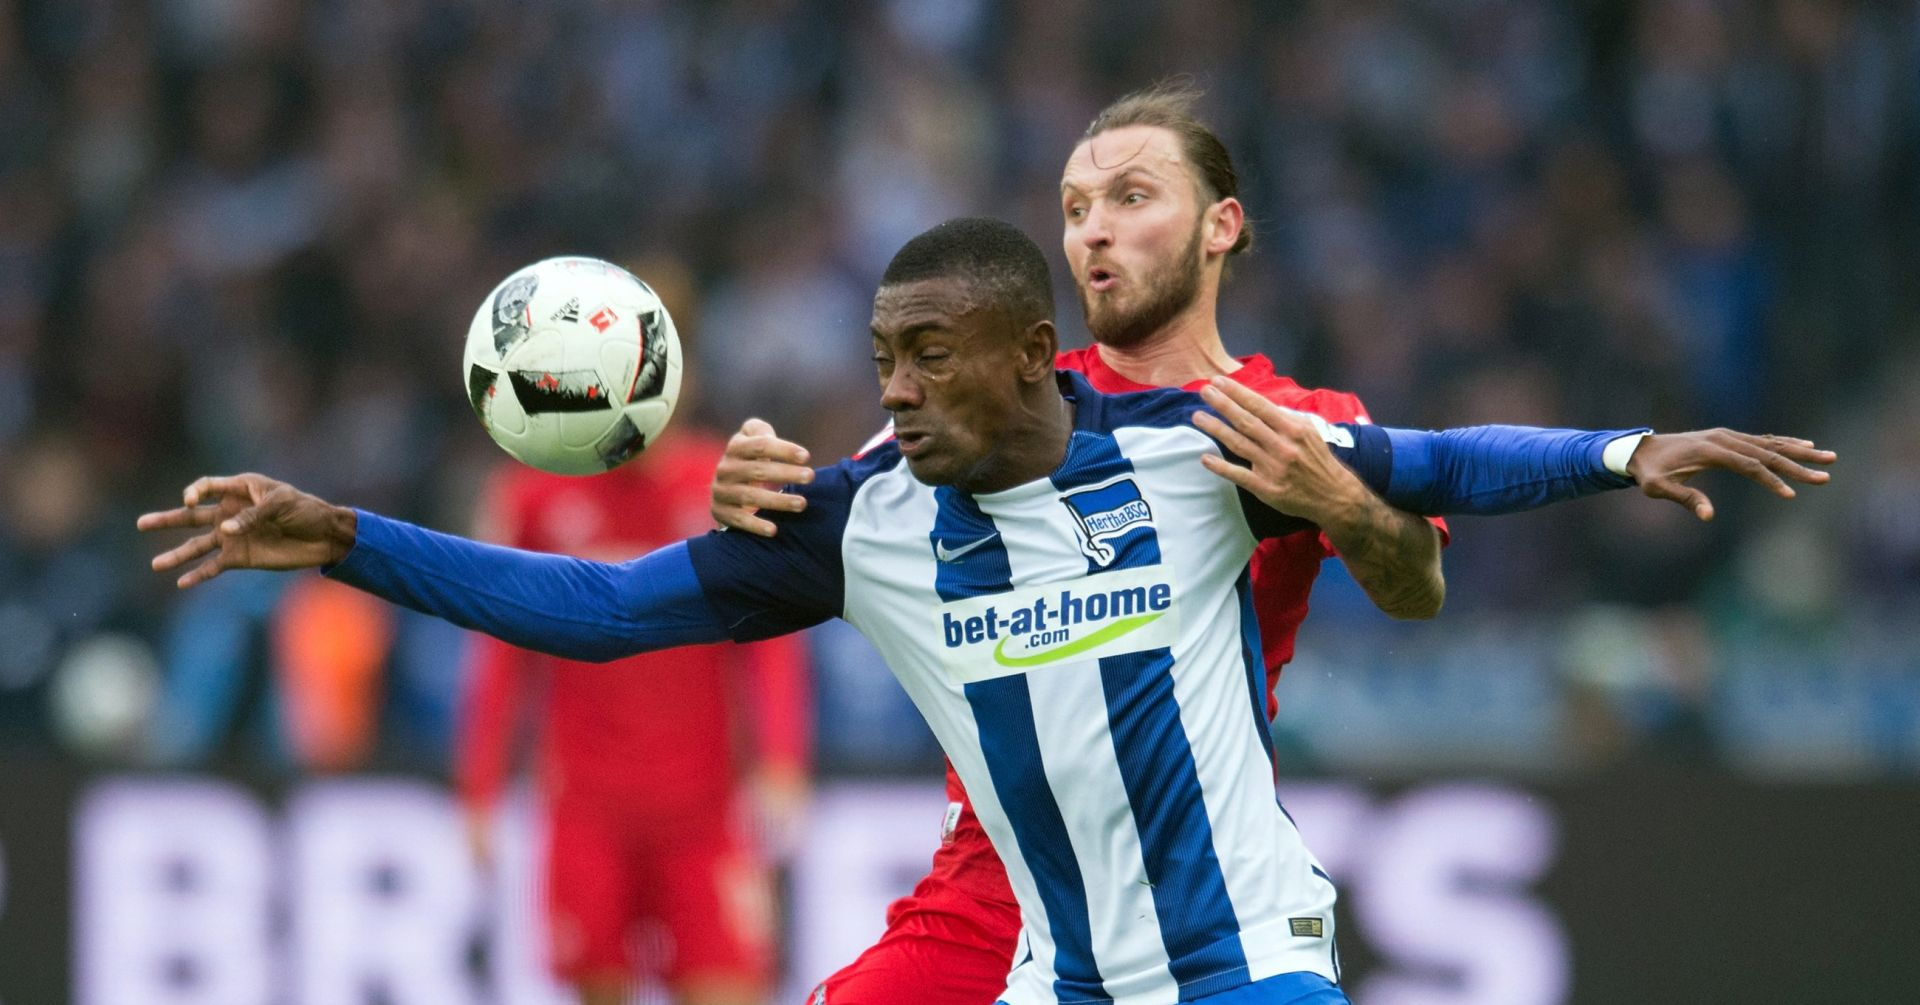 BUNDESLIGA Težak poraz Borussije Mönchengladbach kod Herthe, hat-trick Kaloua